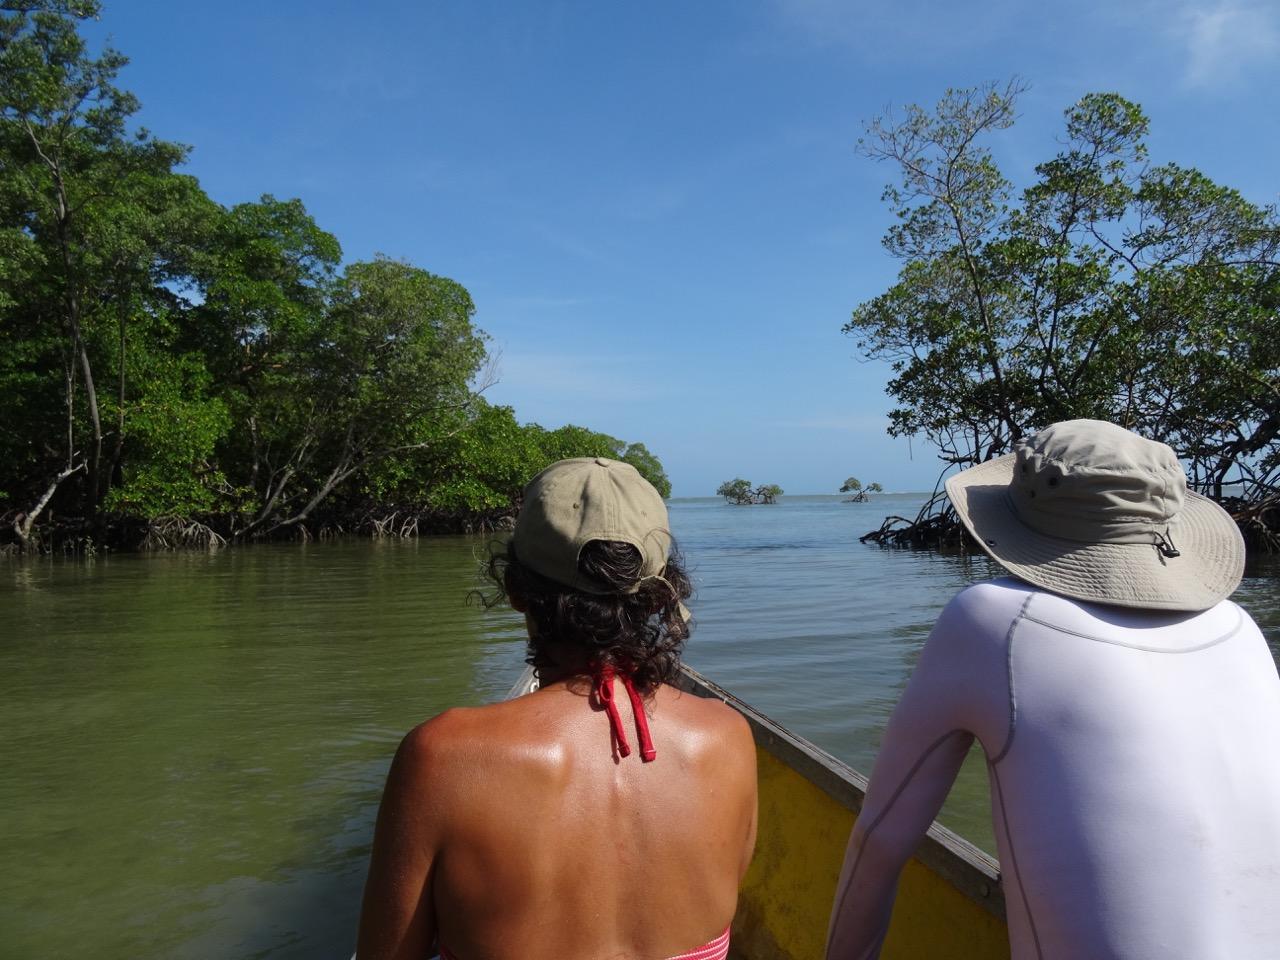 Balade de pirogue dans la mangrove